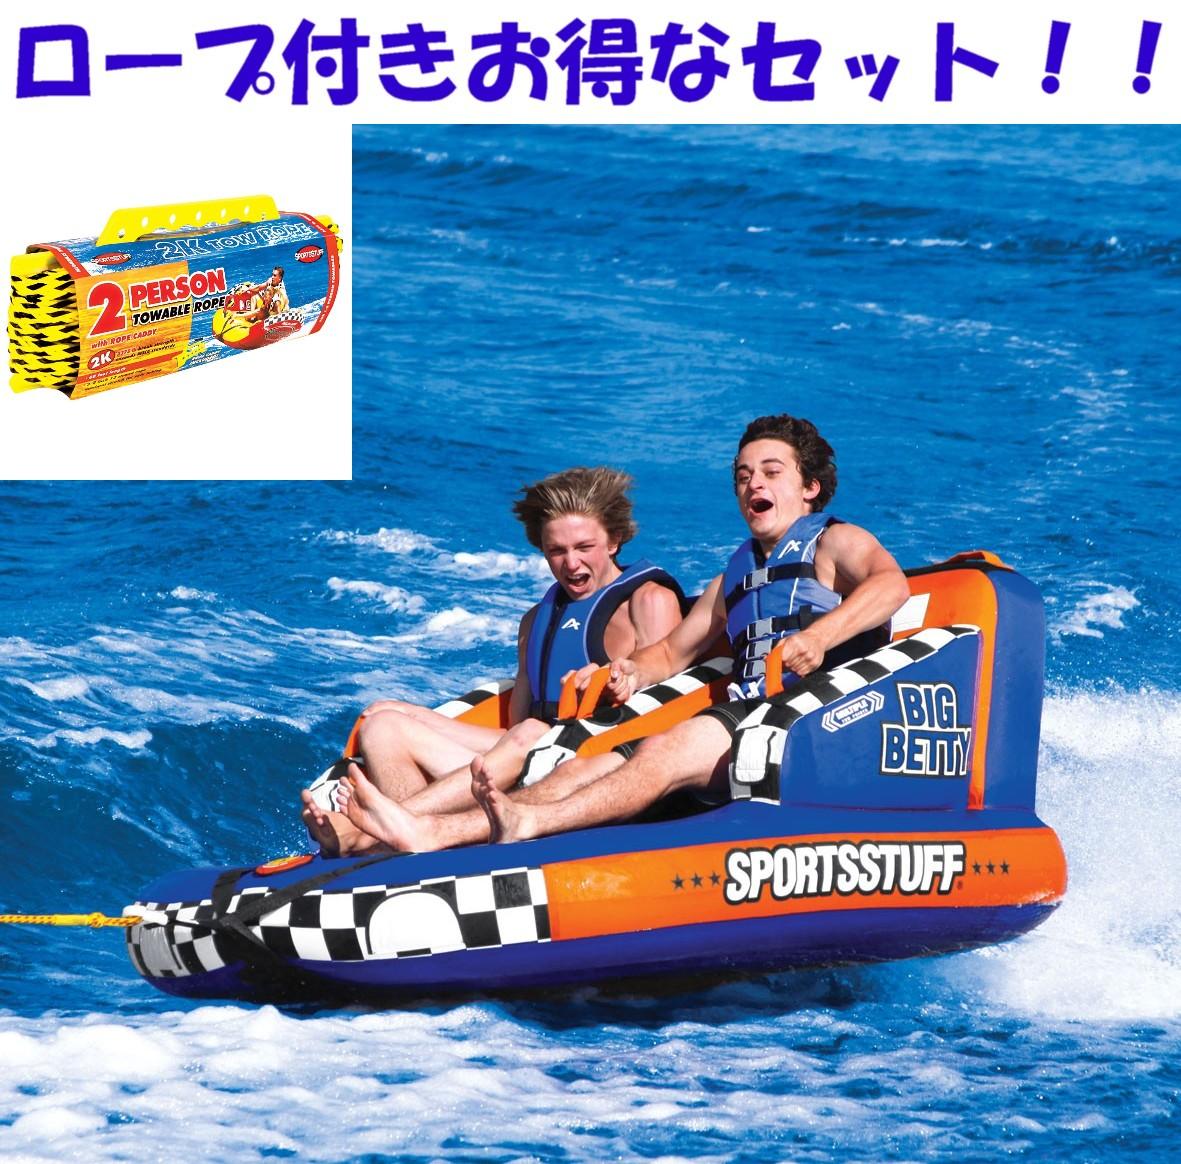 SPORTSSTUFF BIG BETTY 2人乗り ビッグベティ トーイングチューブ/ウォータートーイ/バナナボート/スポーツスタッフ 53-3002 ロープセット